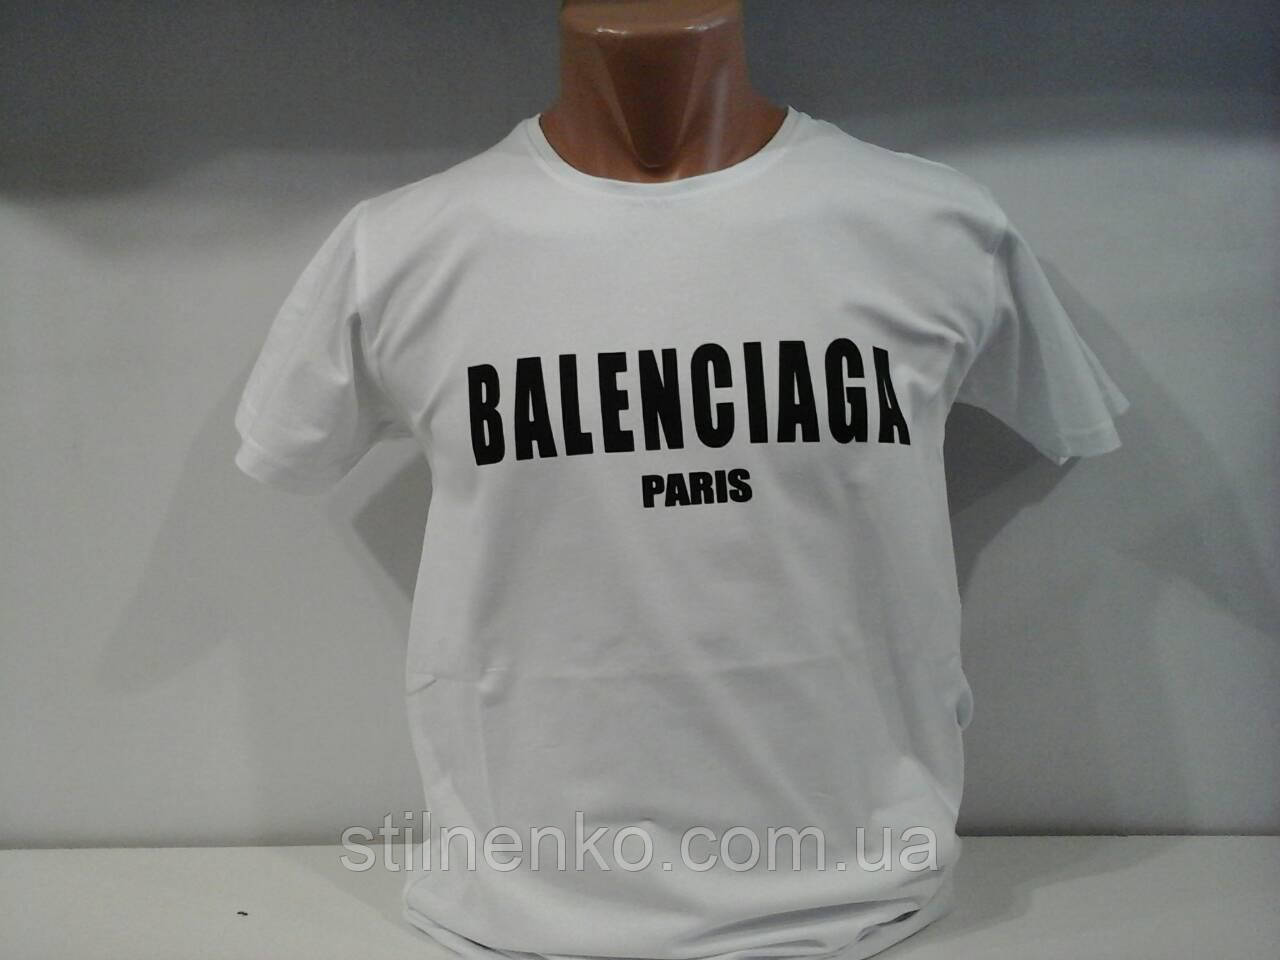 Футболка мужская  Balenciaga р-р M. L. XL. 2XL